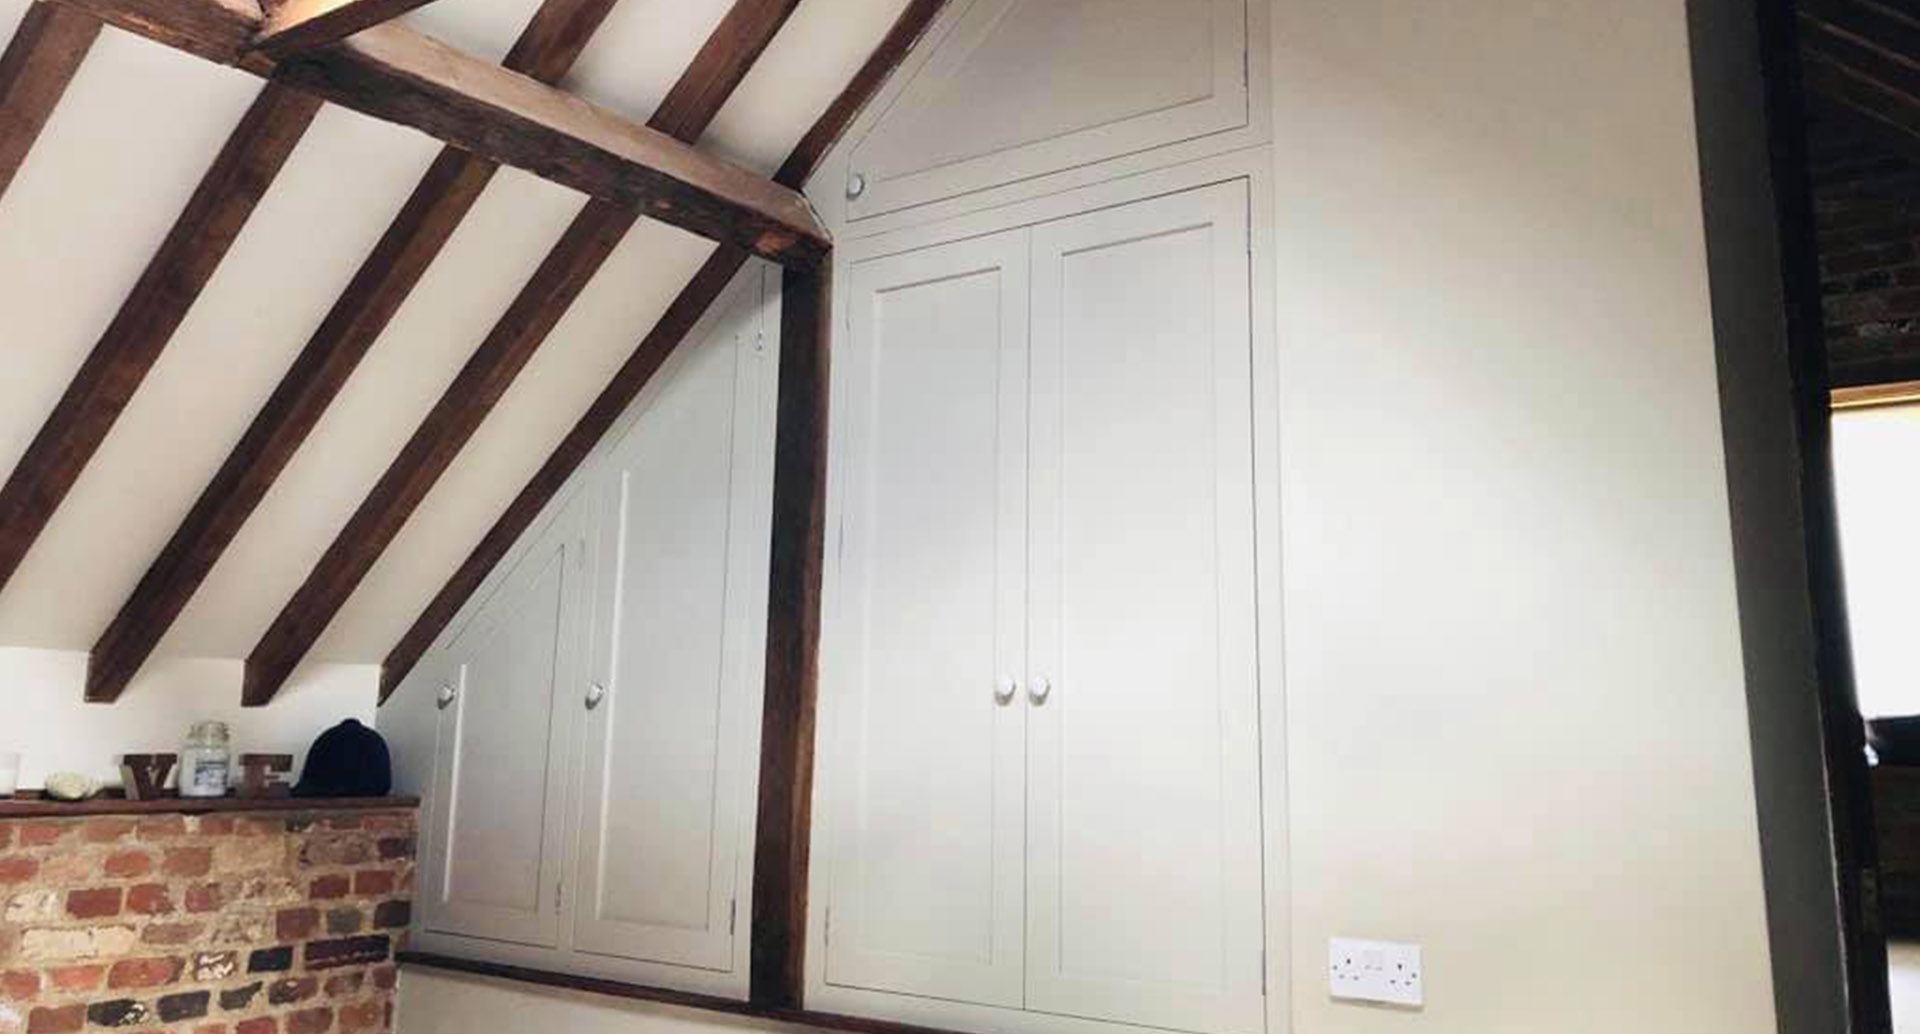 Bespoke wardrobe in attic bedroom with wooden beams